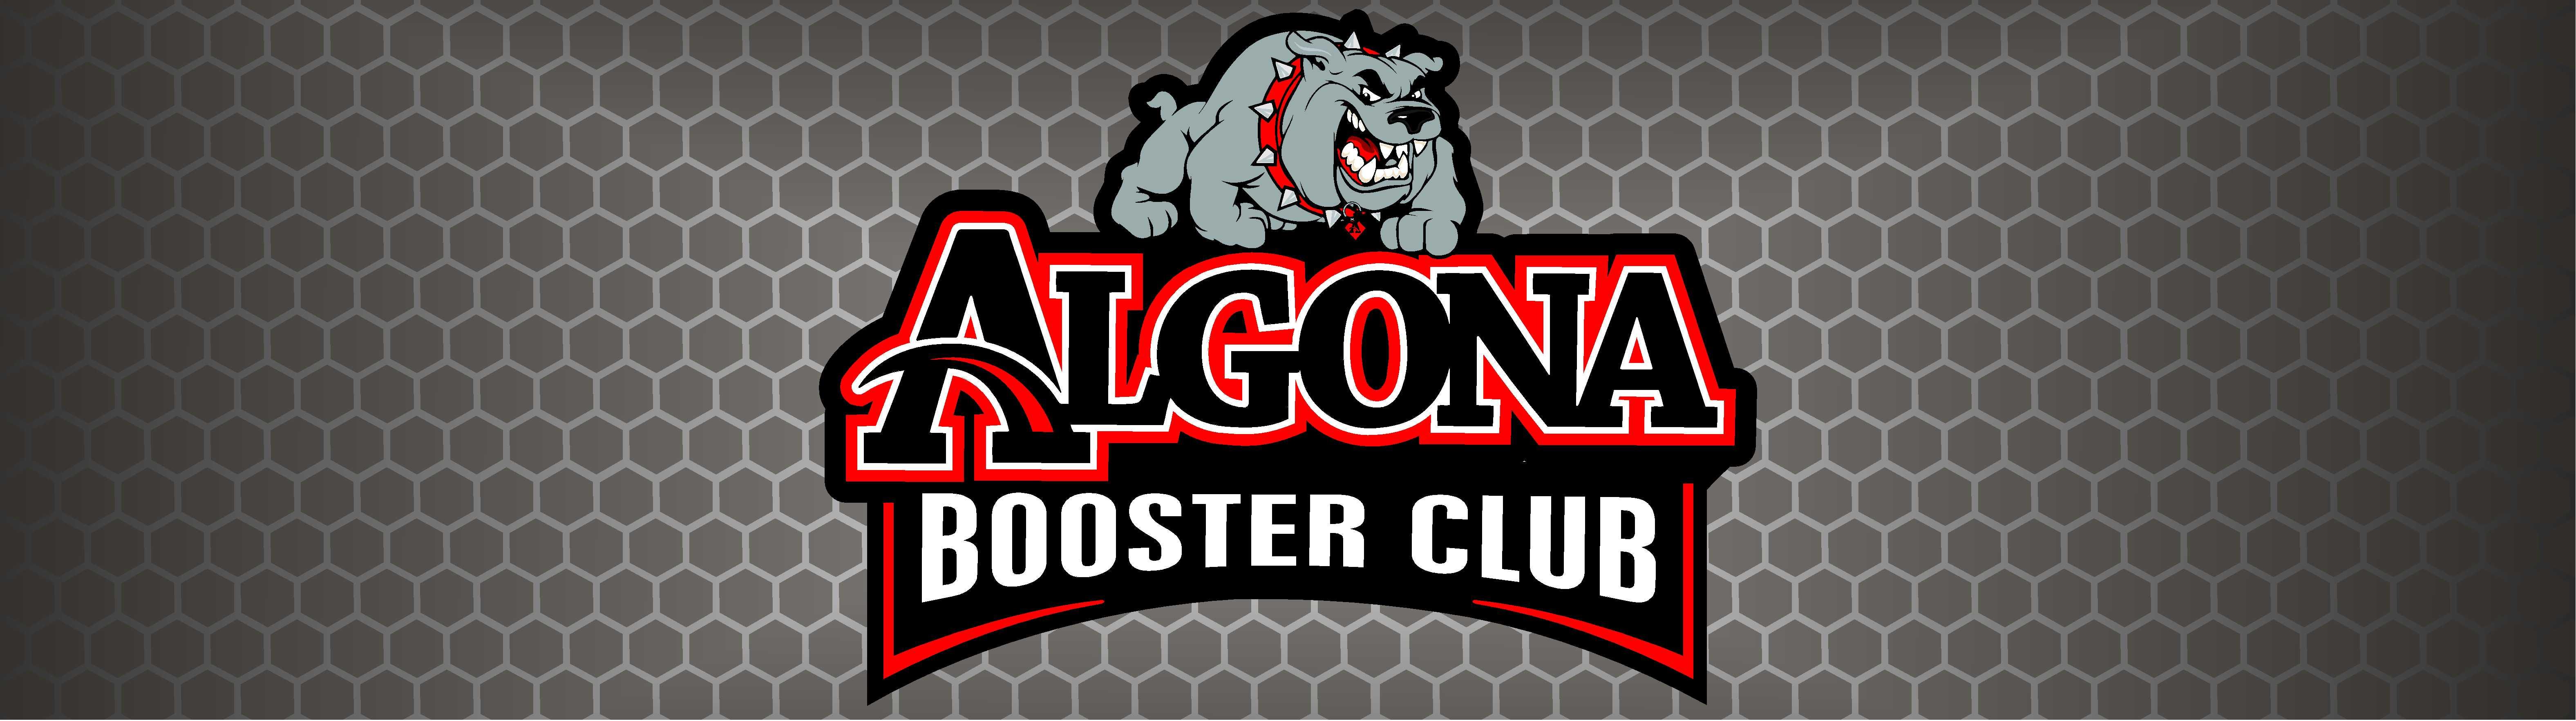 Algona Booster Club banner